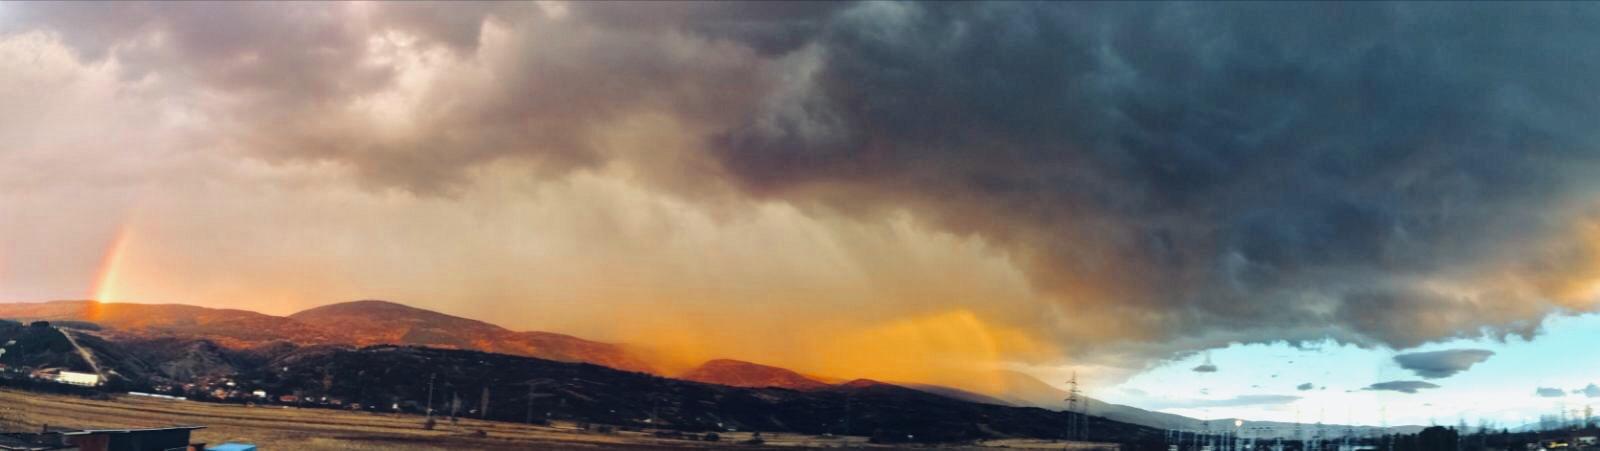 Photo of Prelepa duga, grad, grmljavina, kiša. Fenomenalan prizor na nebu iznad Pirota